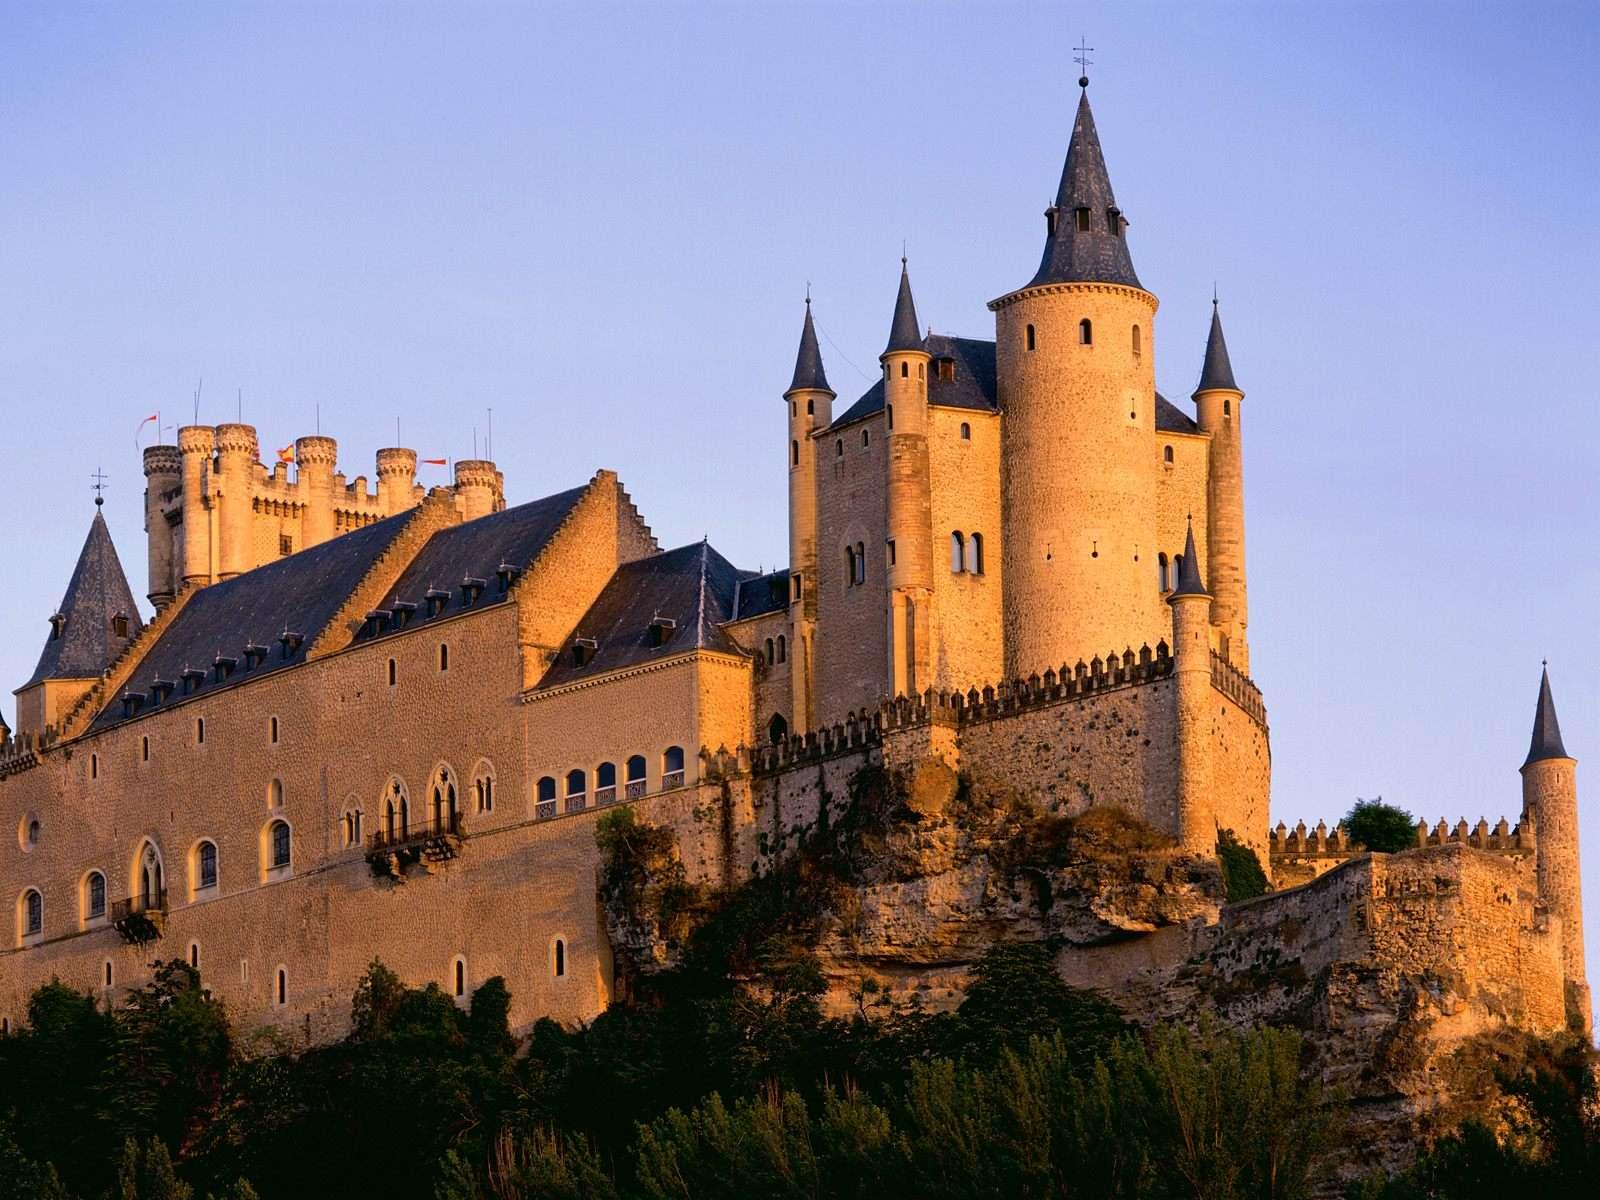 Castle Wallpaper 027